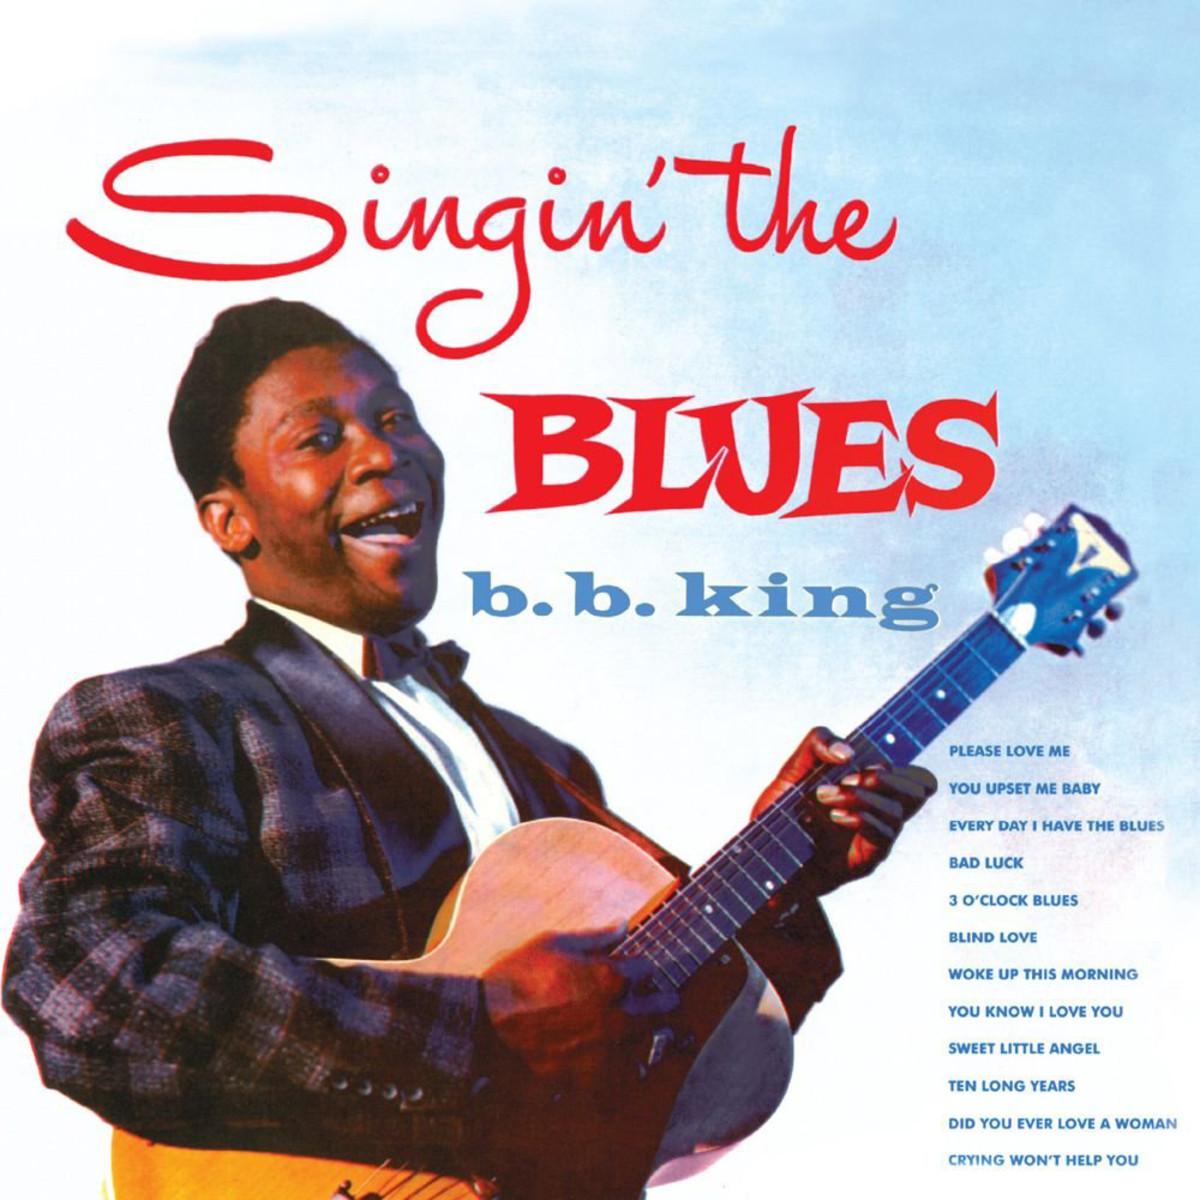 B.B. King, Singing The Blues